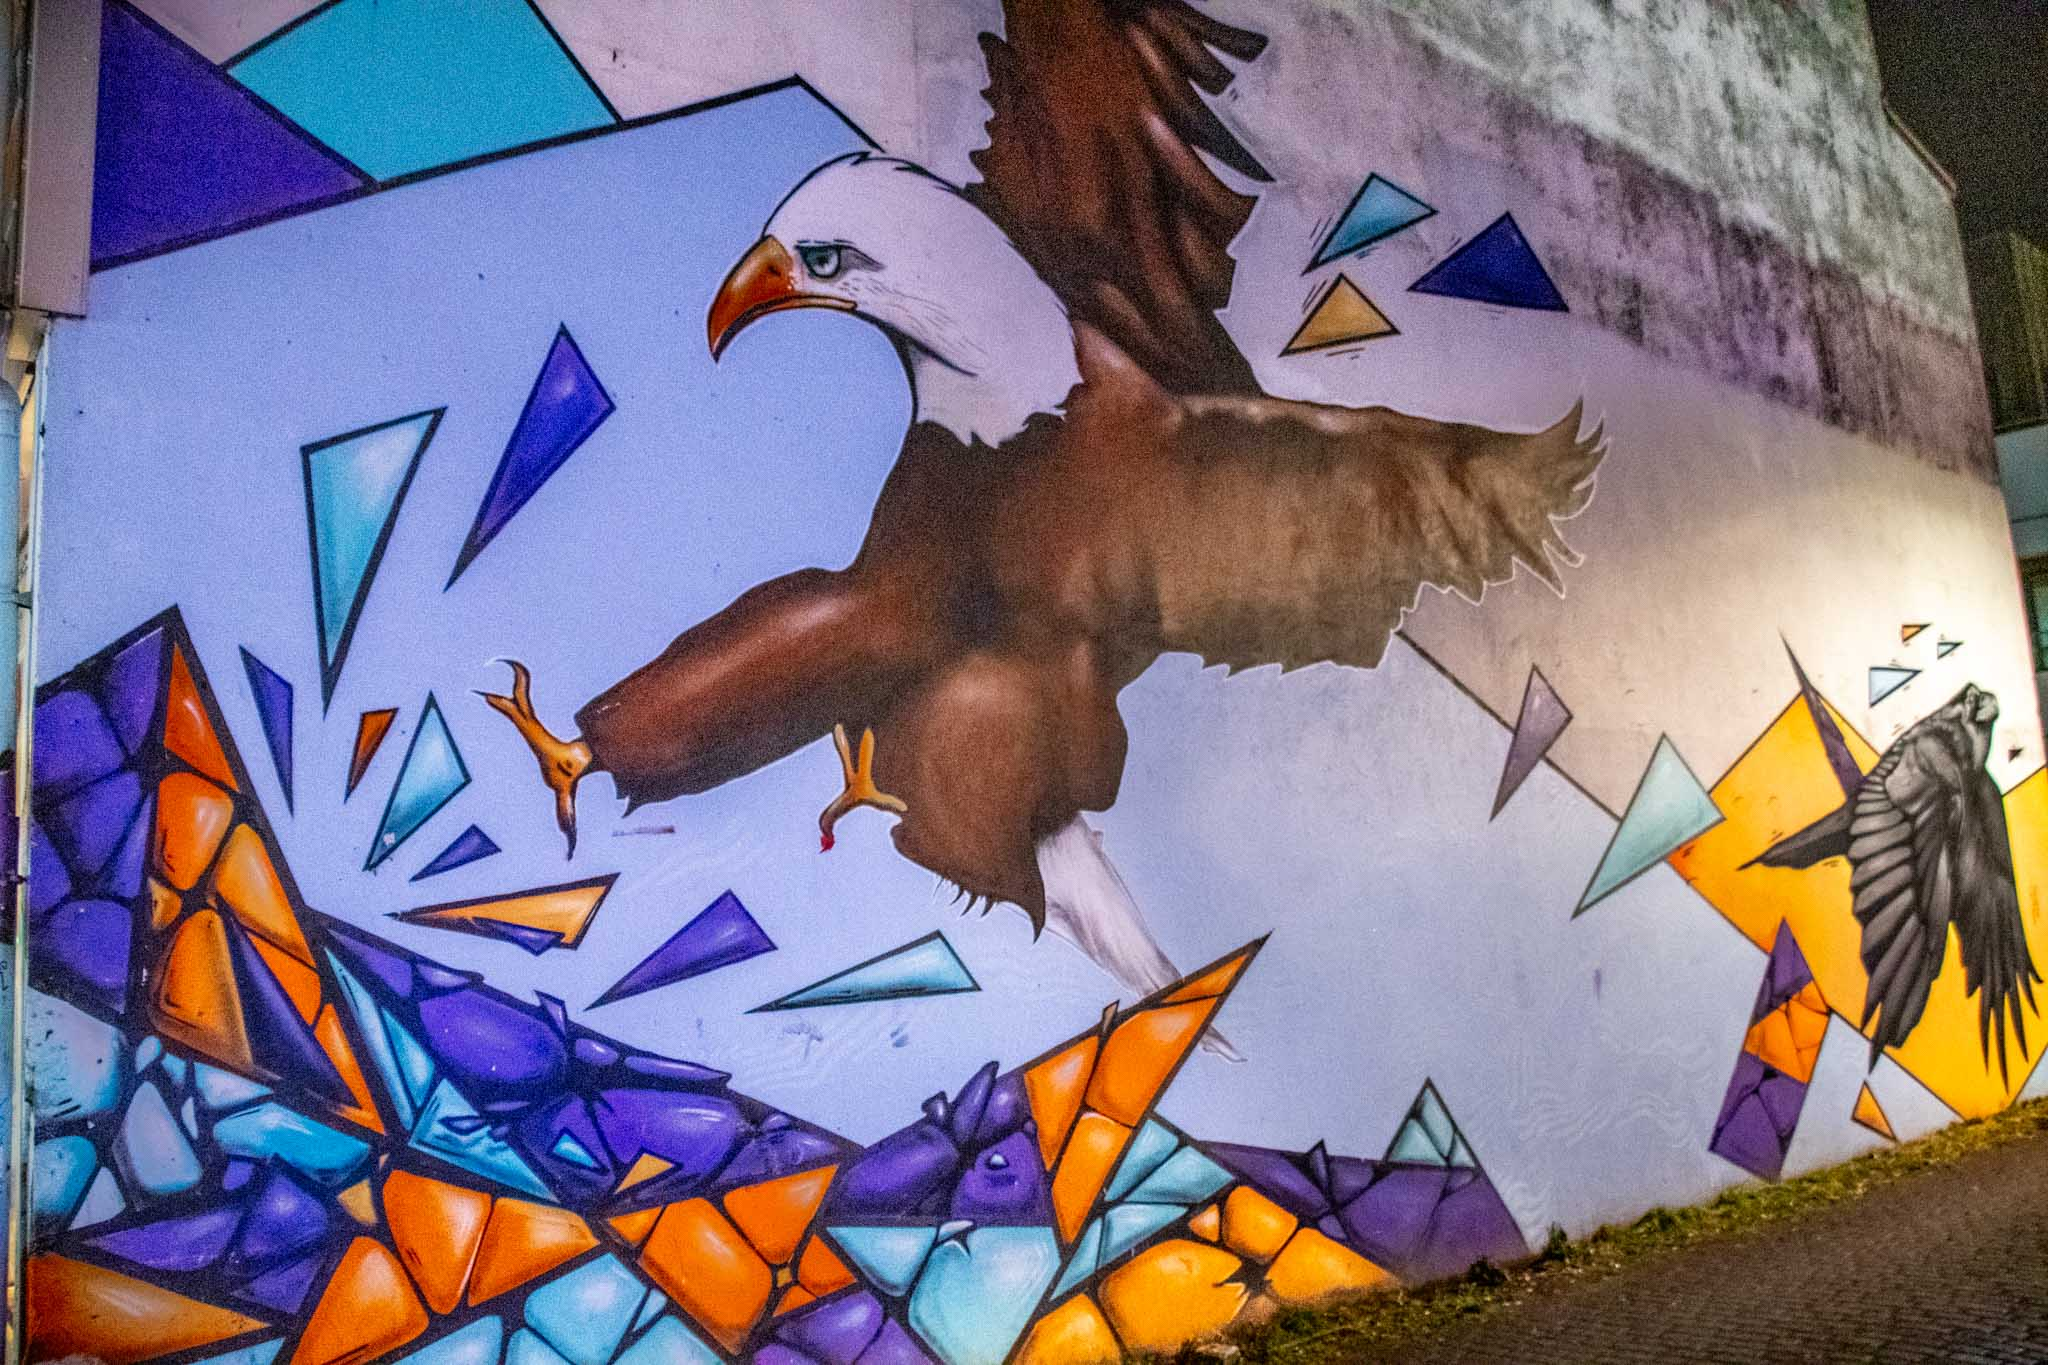 Bald eagle mural.